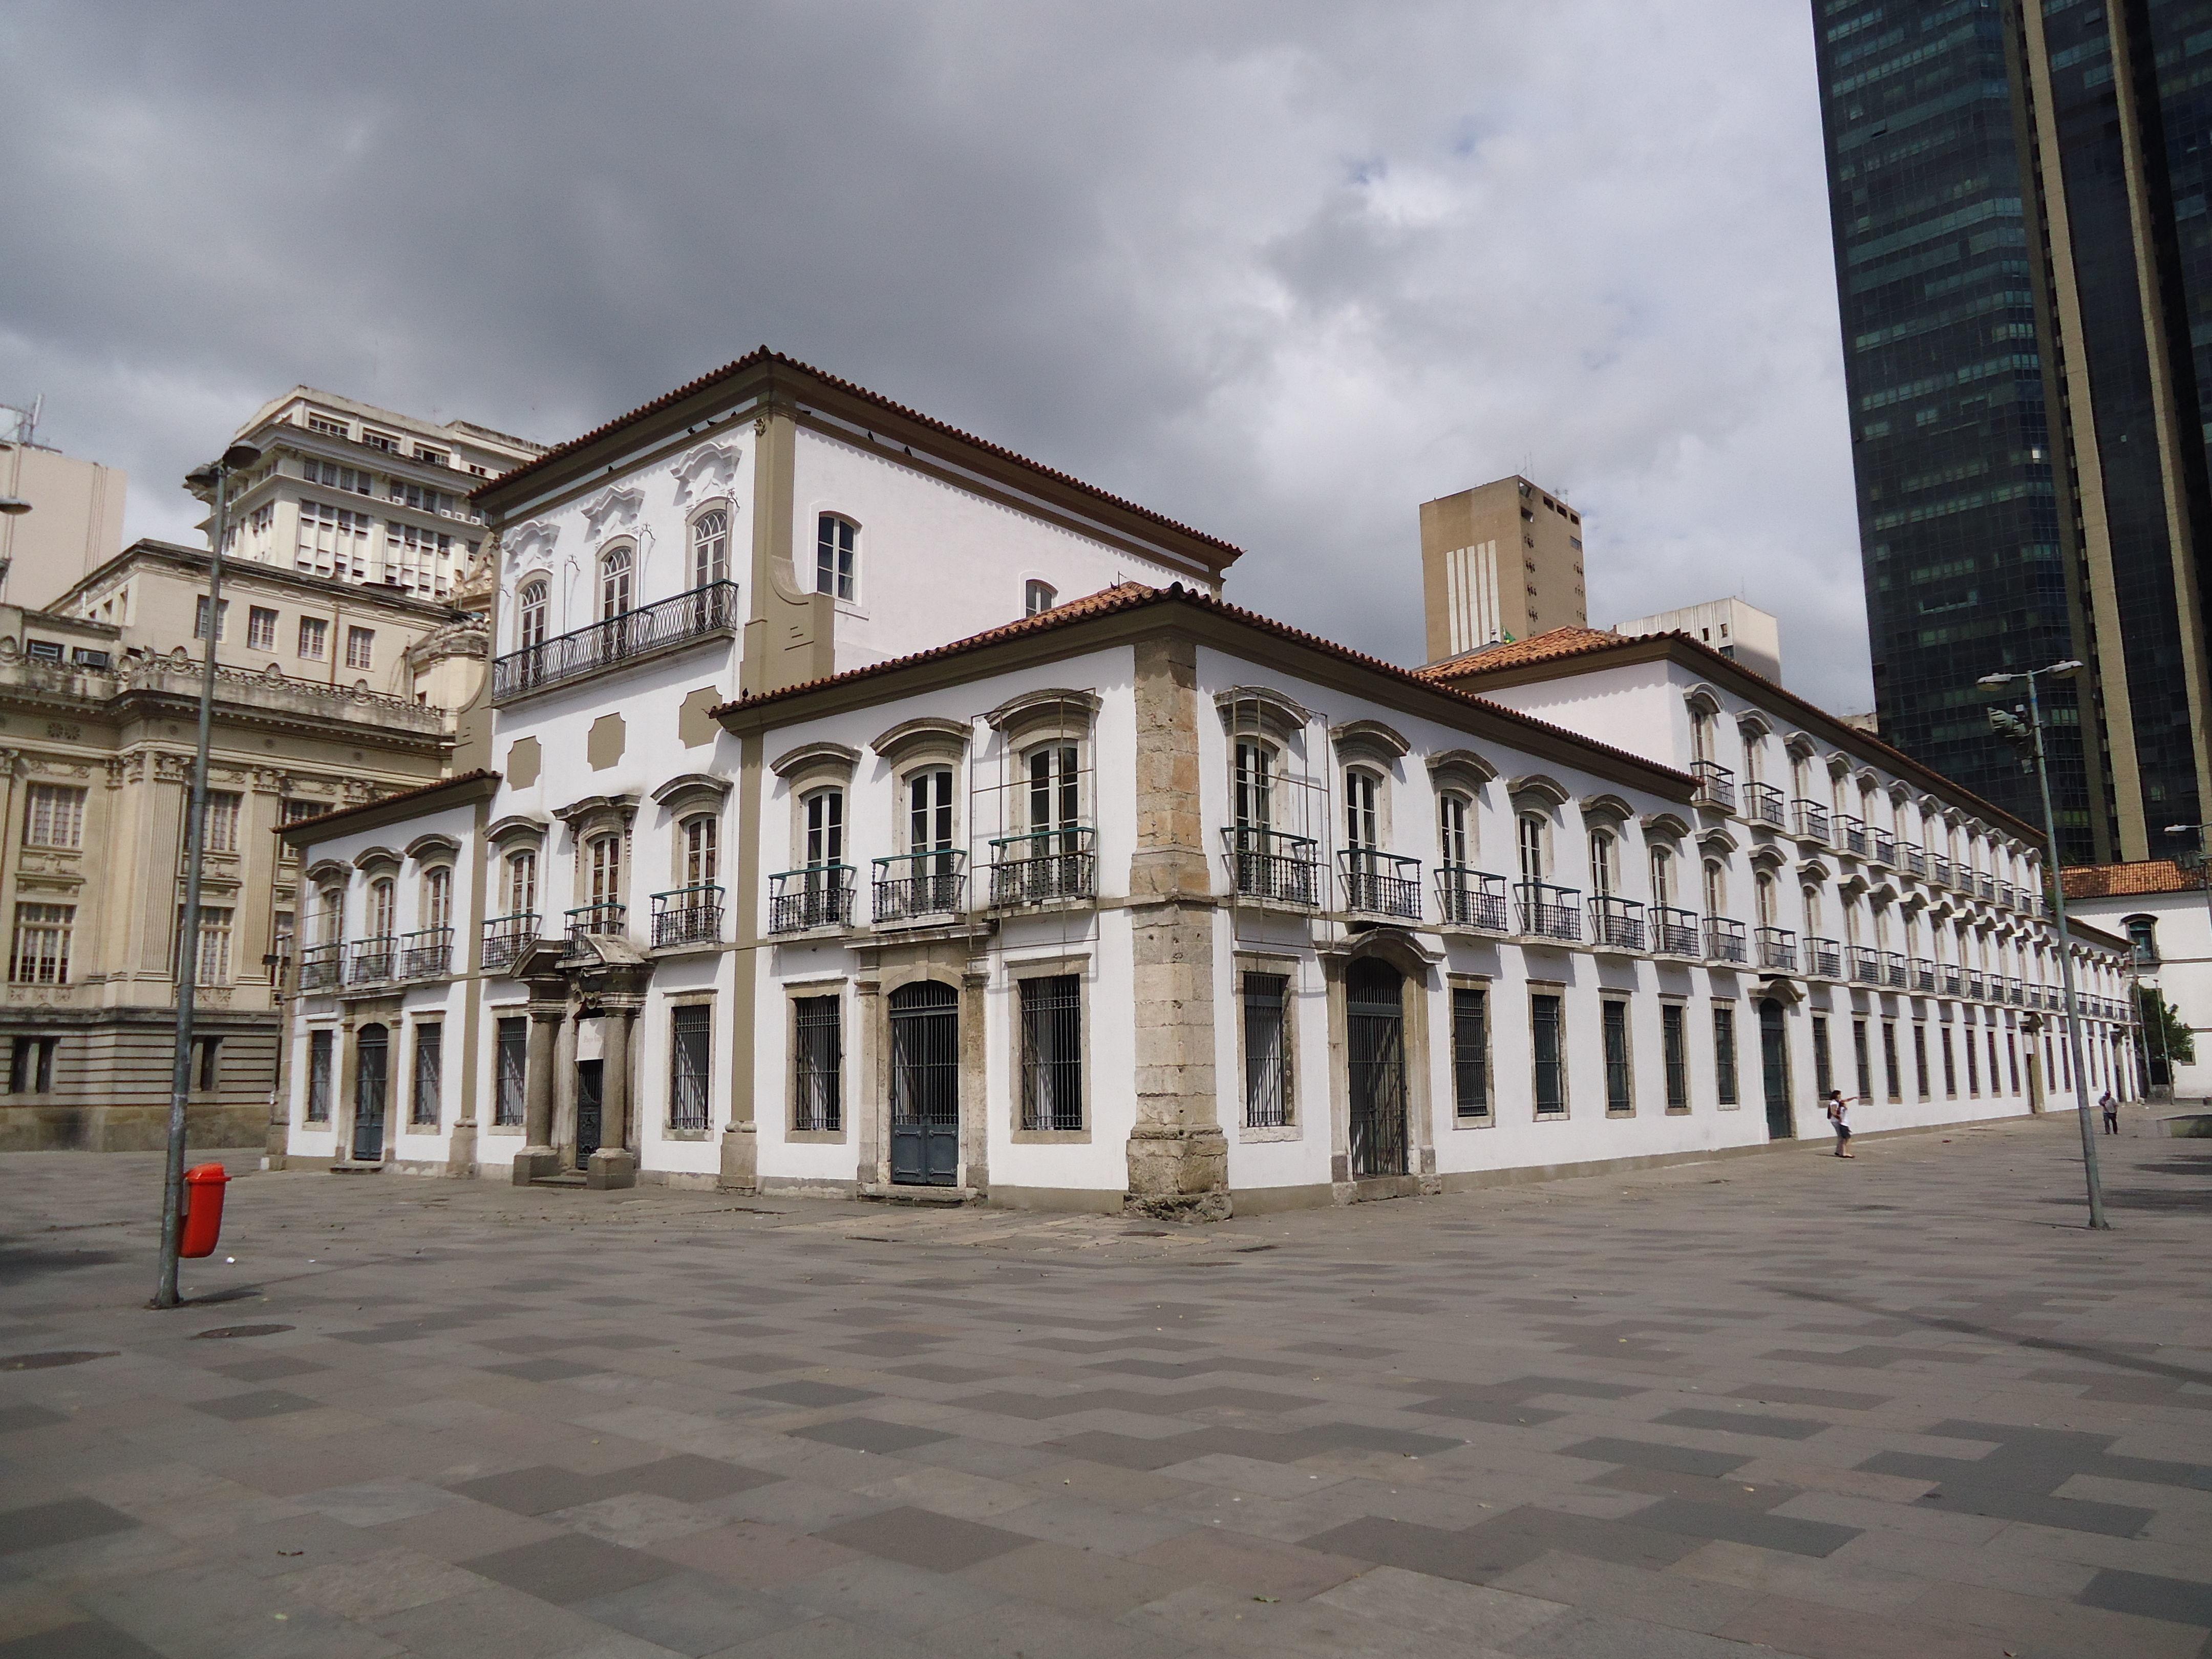 Walking Tour of Rio de Janeiro & Niterói/ Excursão à pé - Rio de Janeiro e Niterói